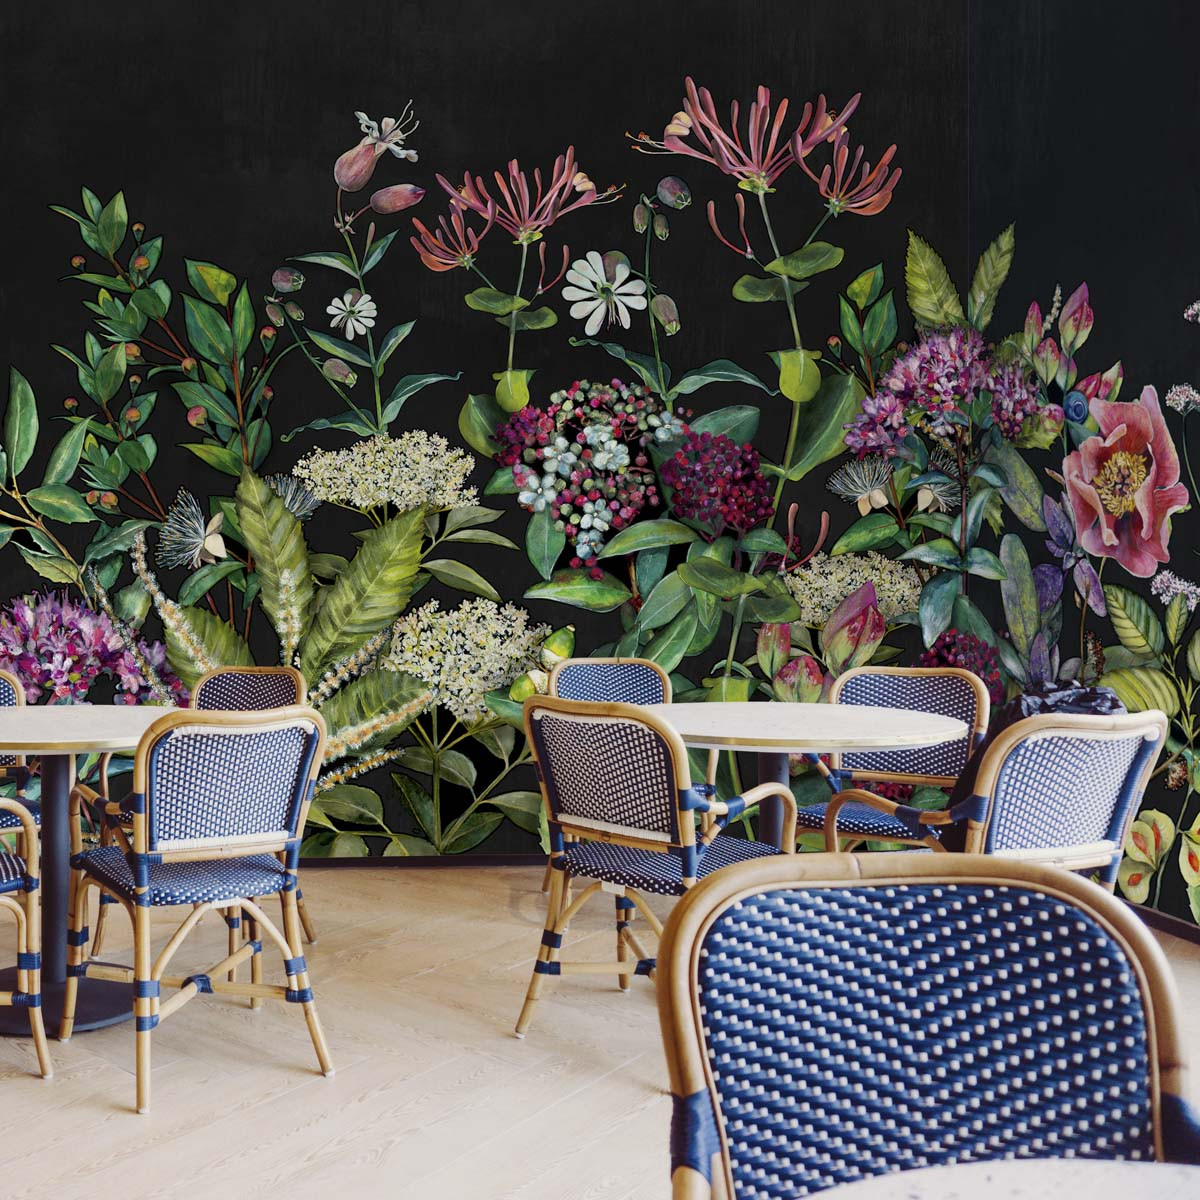 Coordonne Wild Floral Mural Wallpaper